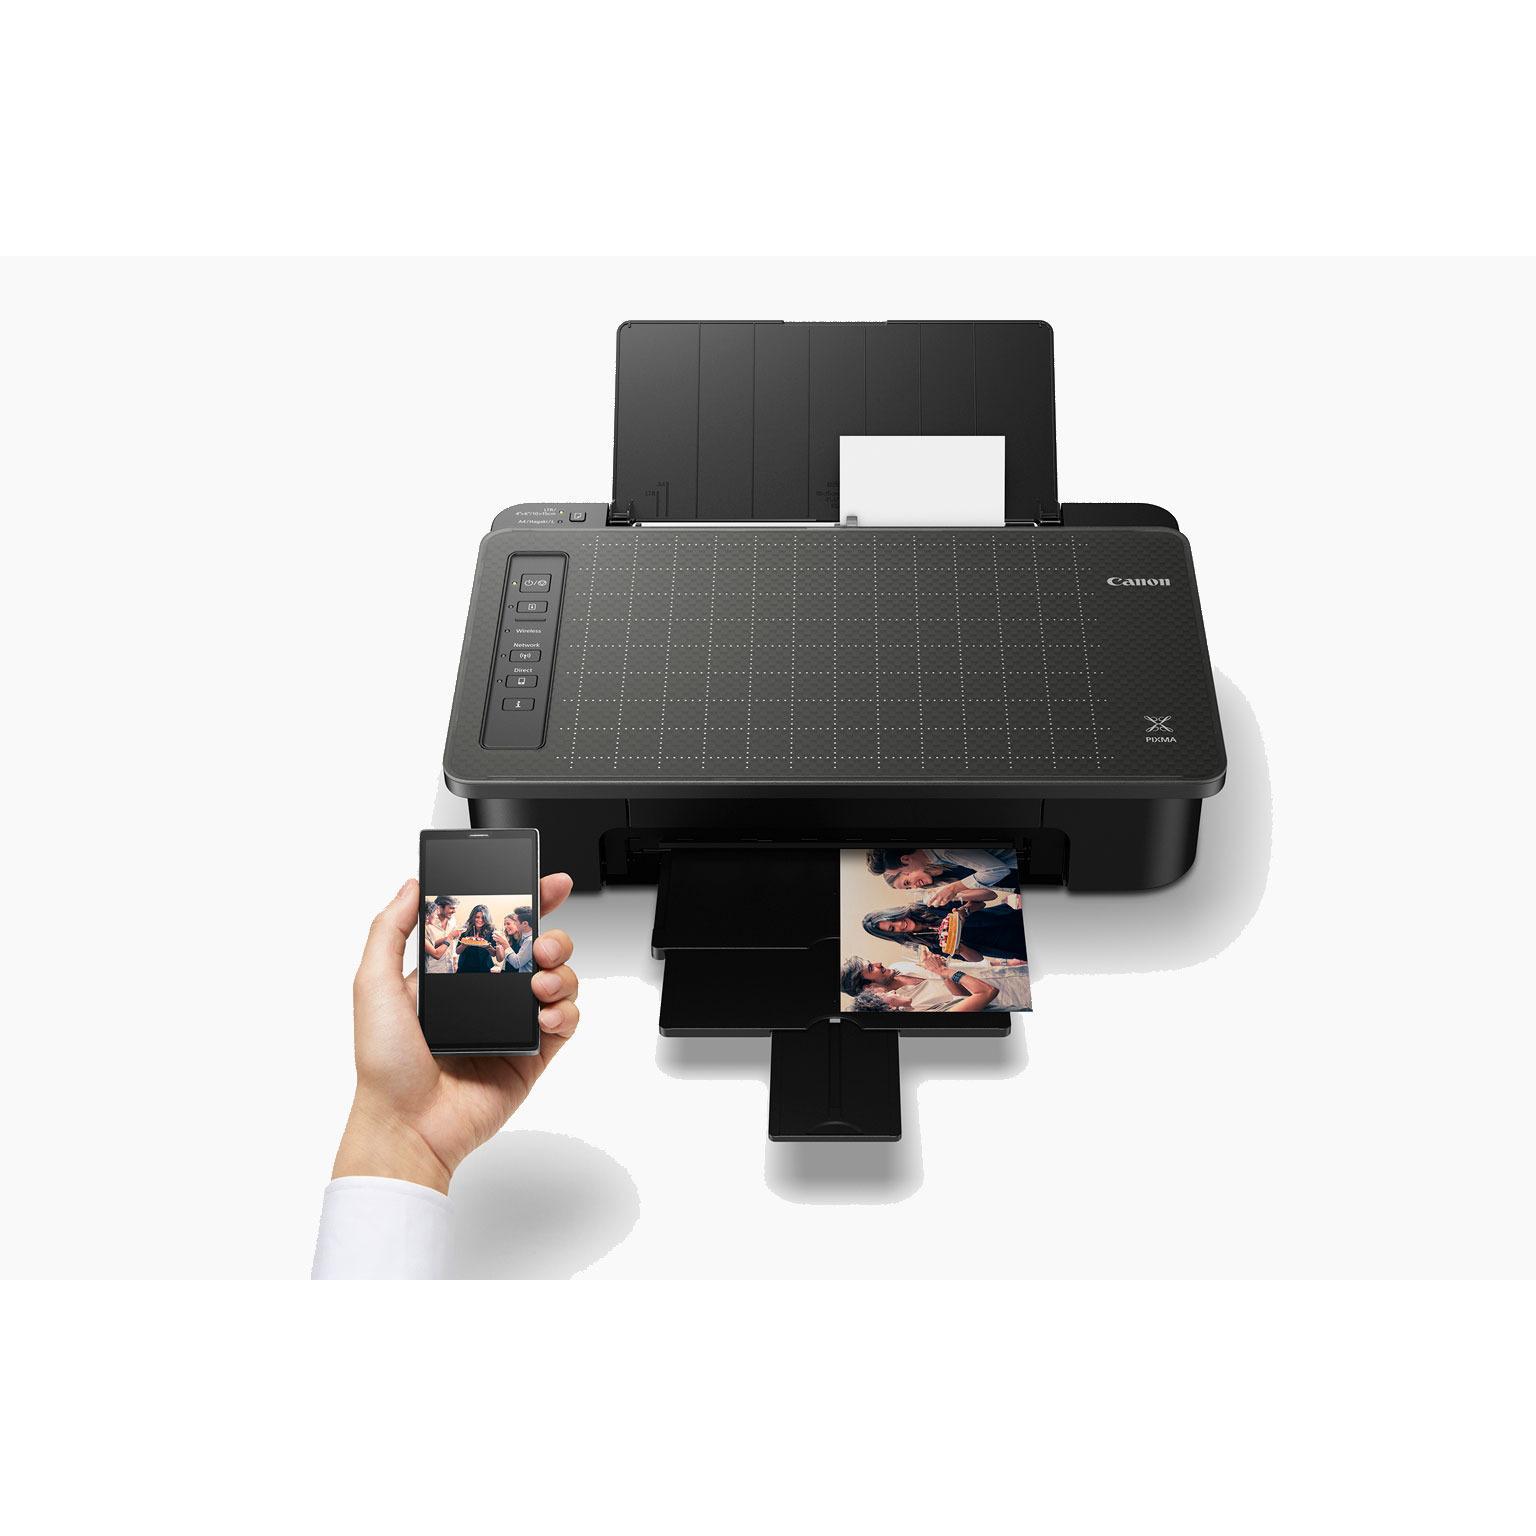 Jual Printer Aksesorisnya Terlengkap Tinta Refill Infuse System Untuk Hp Epson Brother Canon Pixma Ts307 Print Copy Wireless Resmi